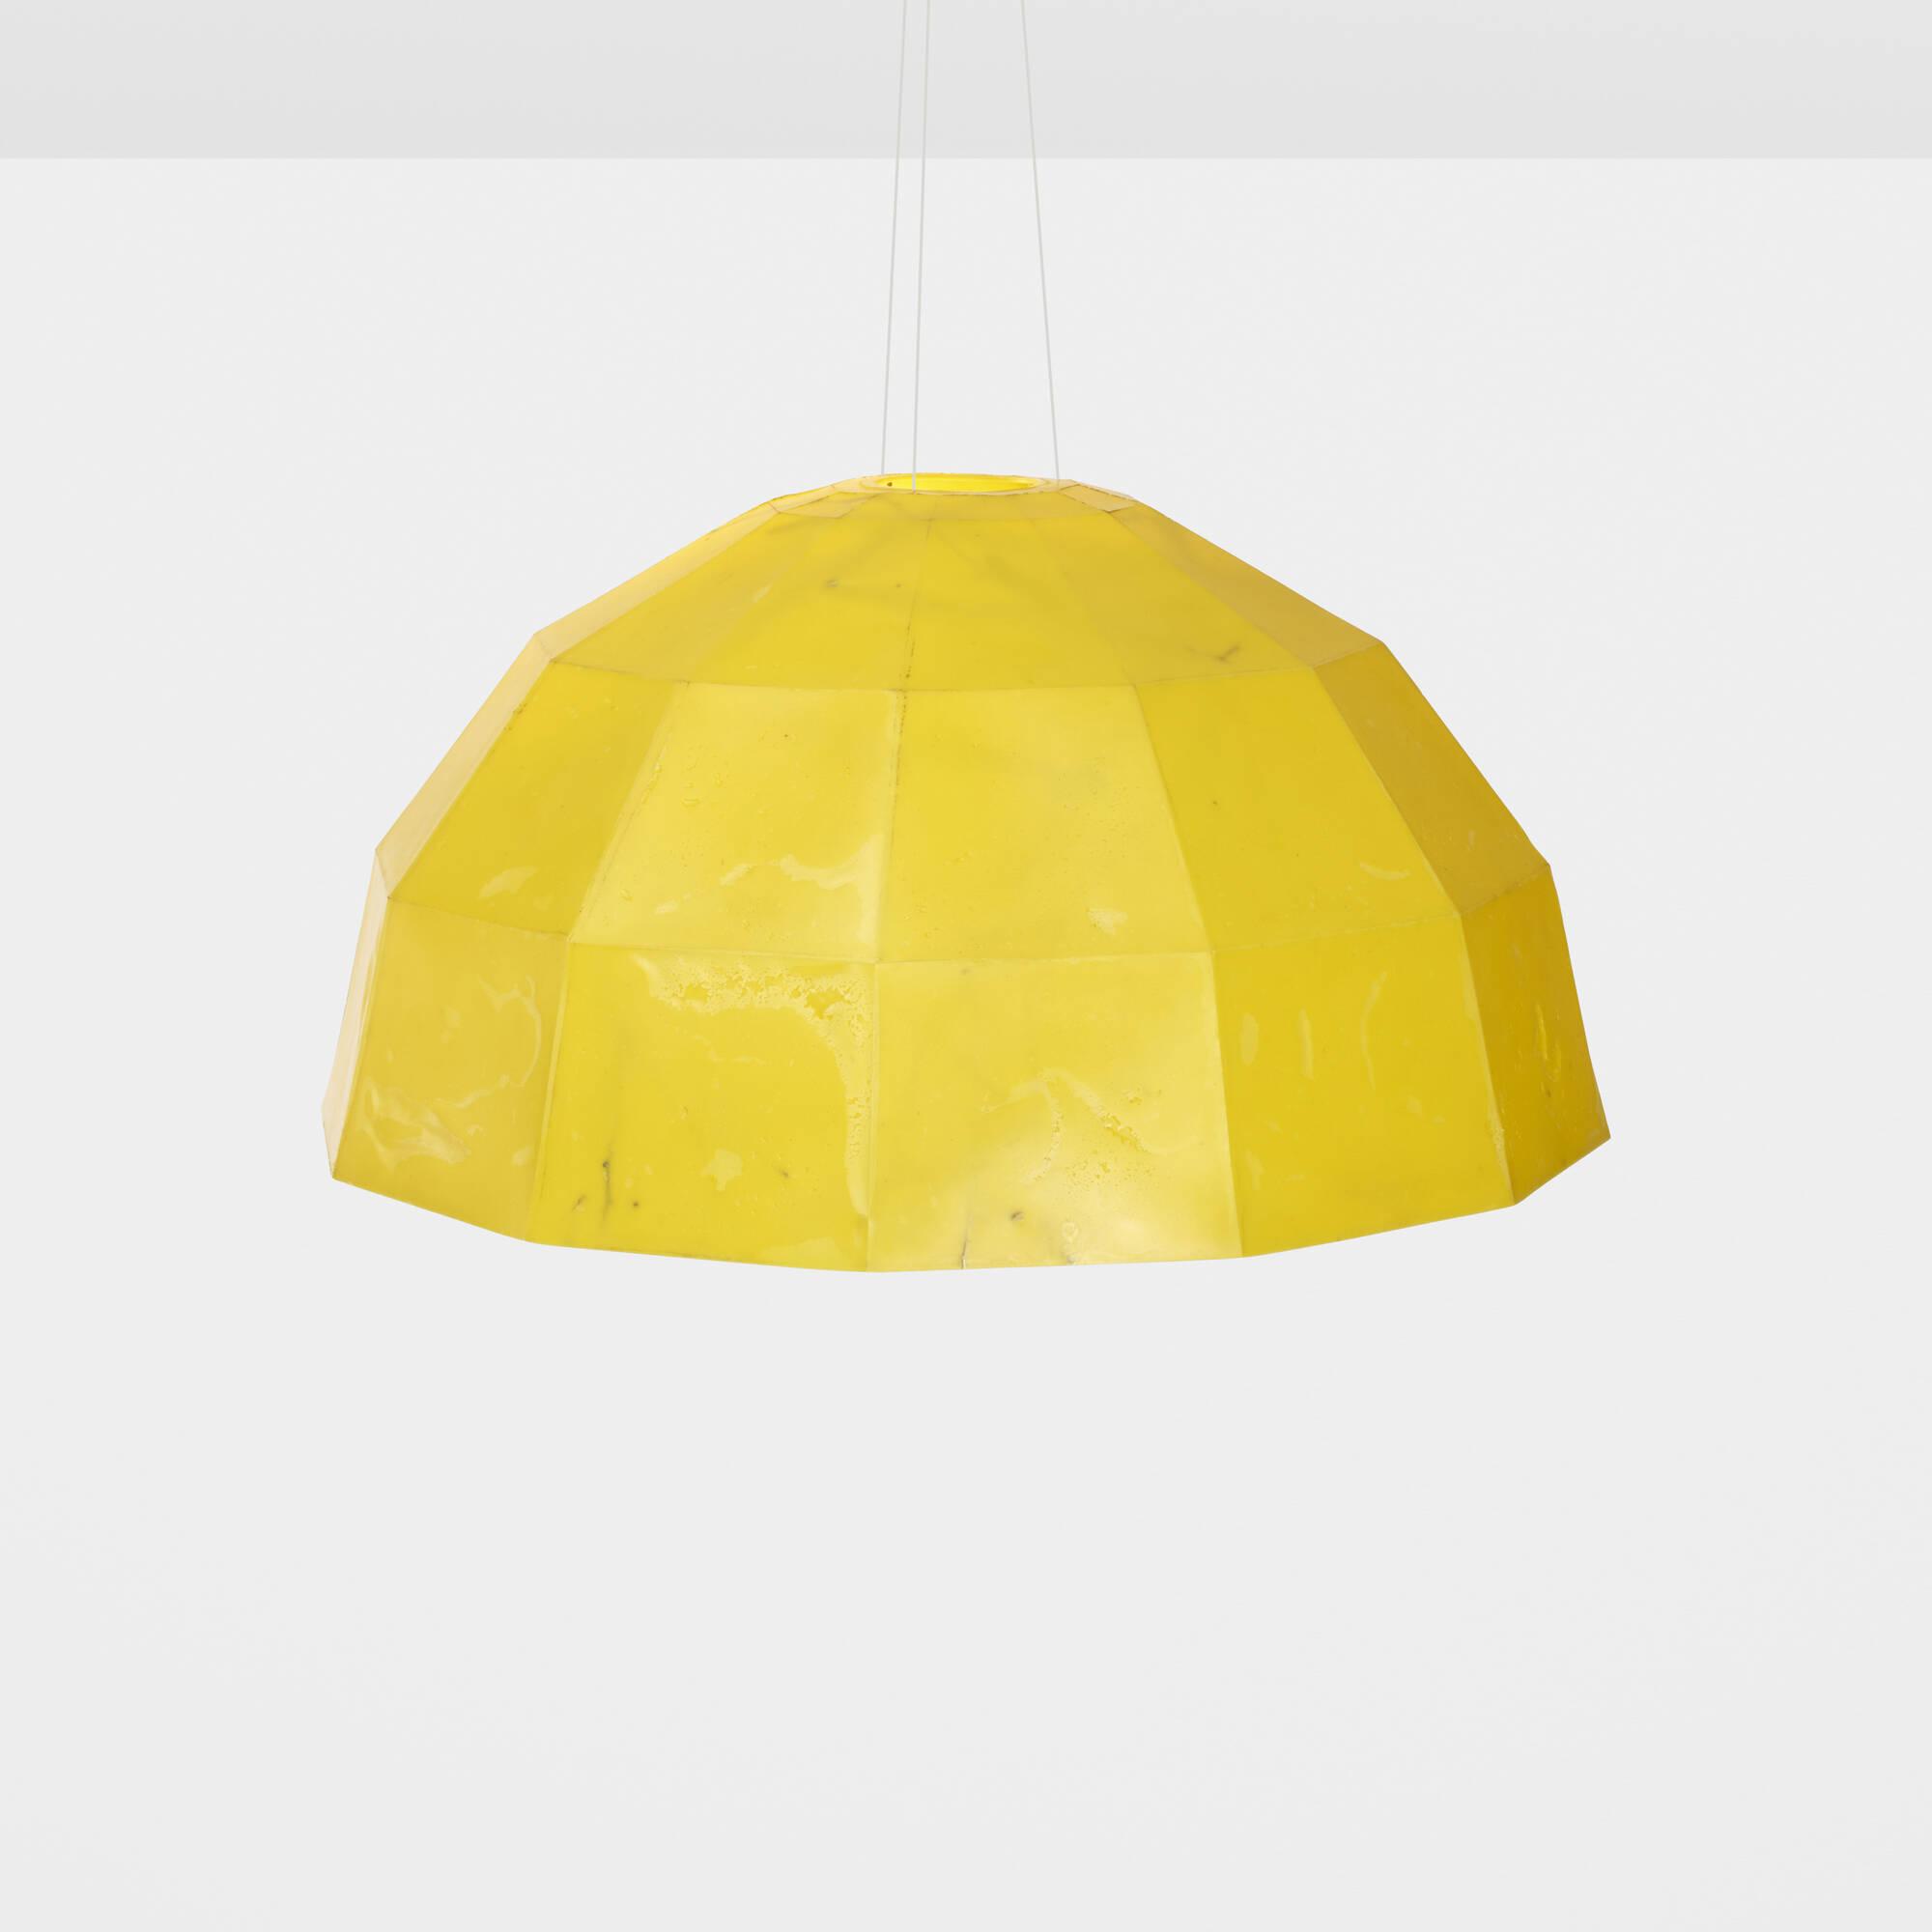 813: Adi Zaffran / RAWtation Dome lamp (1 of 1)